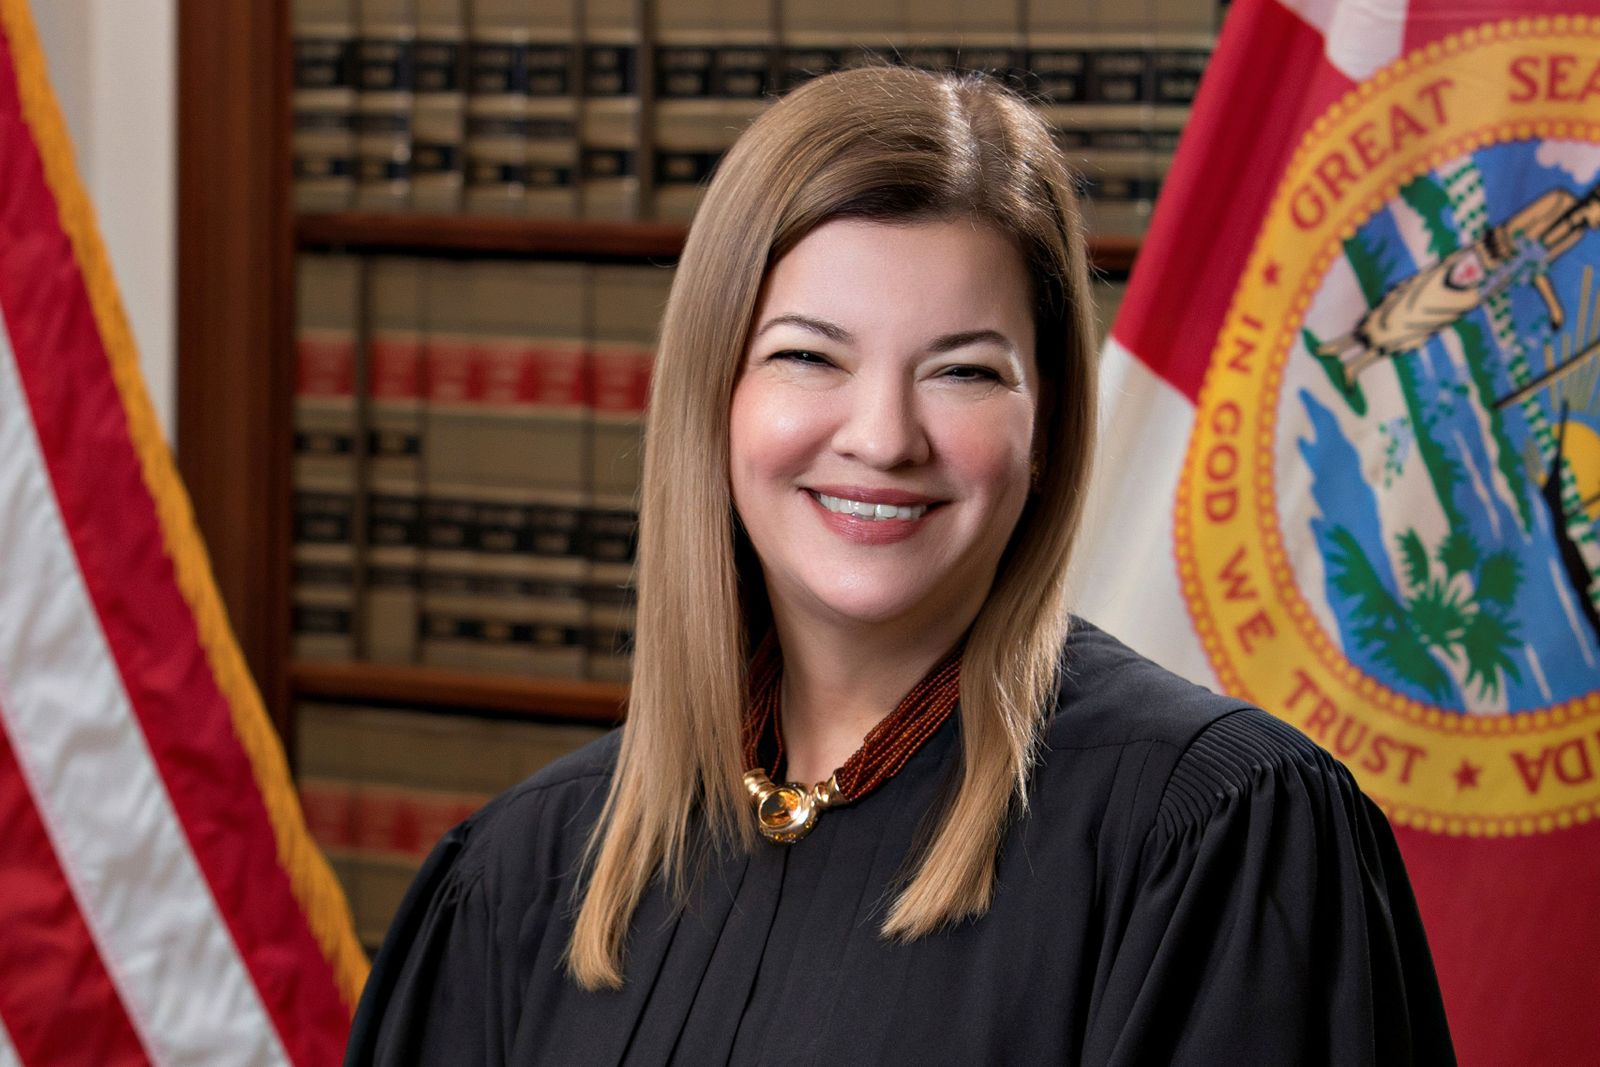 Florida Supreme Court Justice Barbara Lagoa poses in an undated photograph